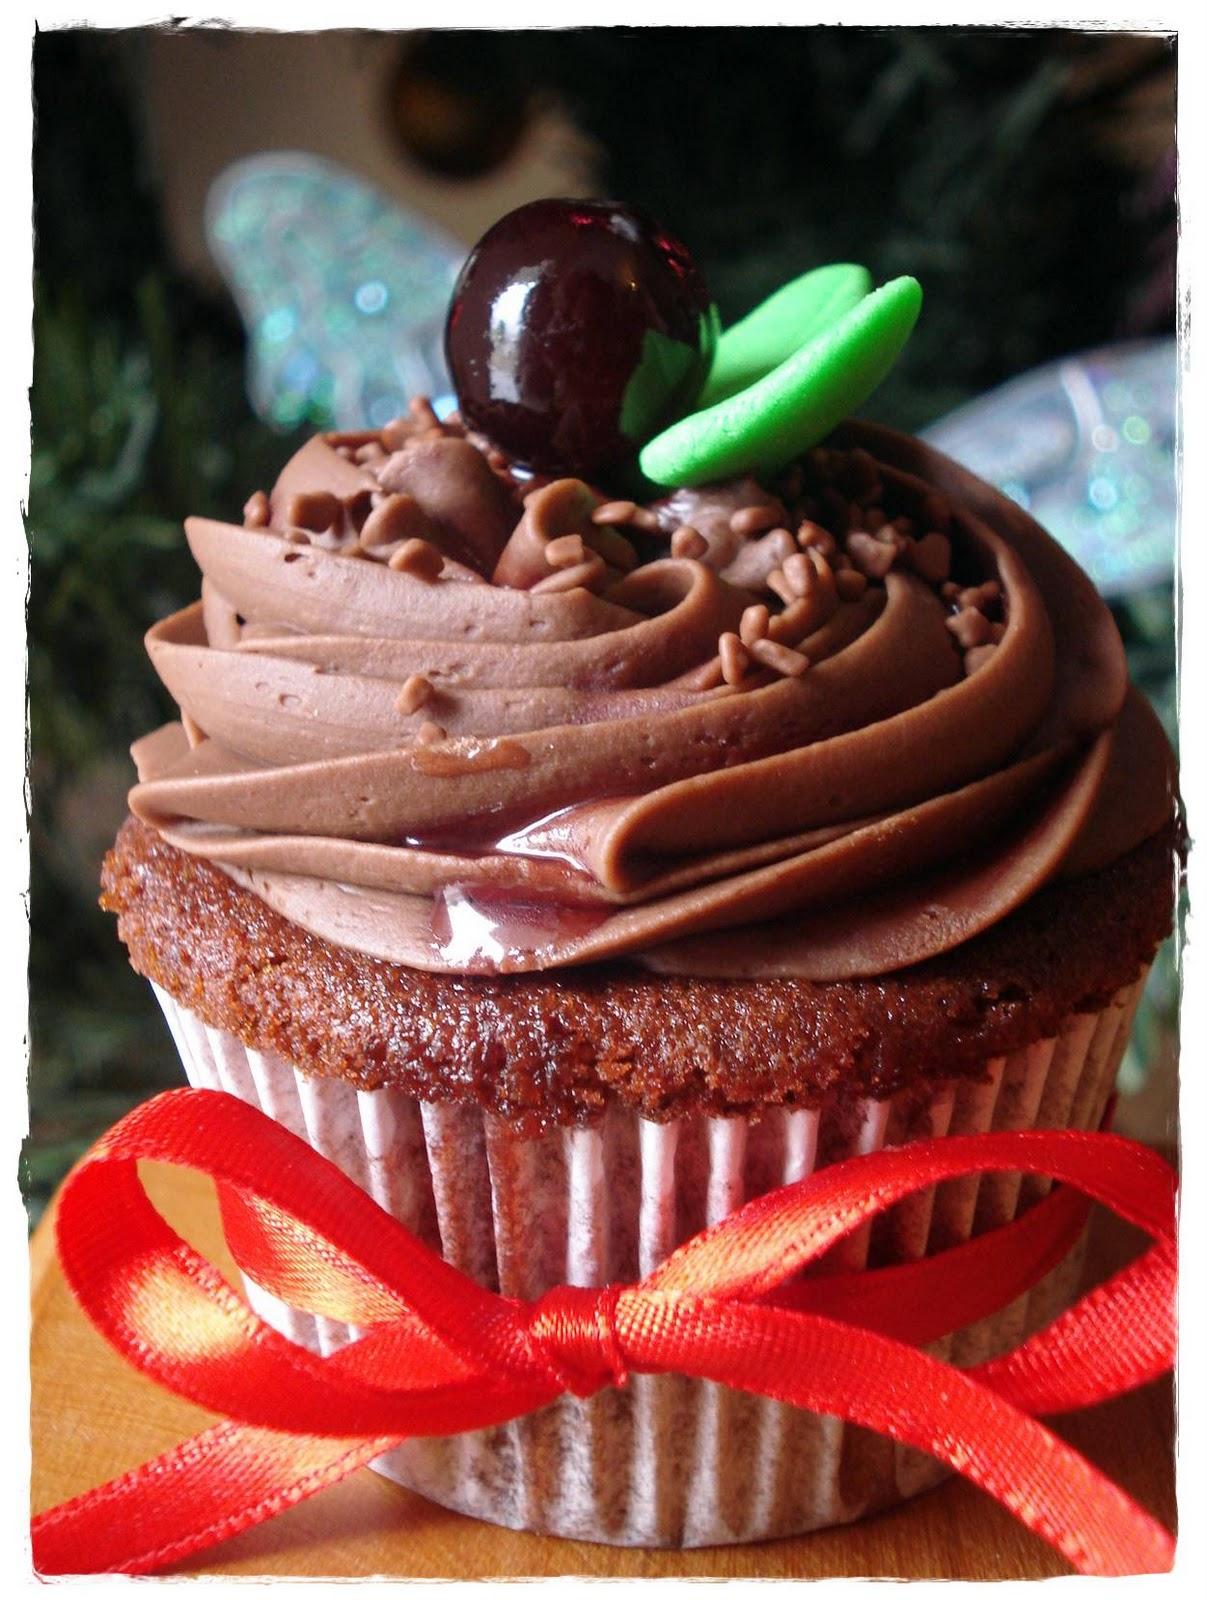 Fofurices: Devil´s food cupcake